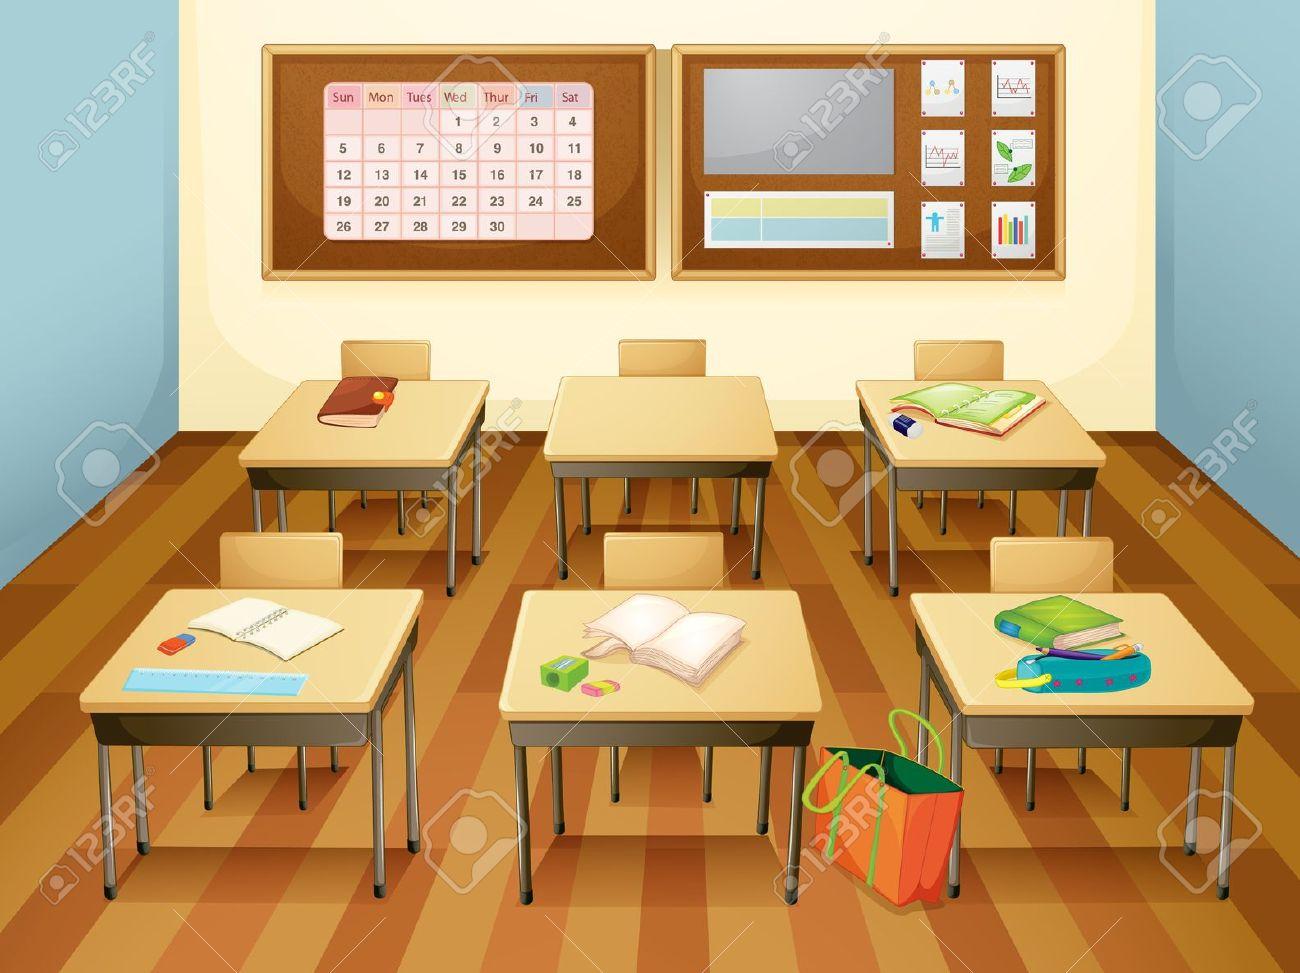 Empty kindergarten classroom clipart 3 » Clipart Station.